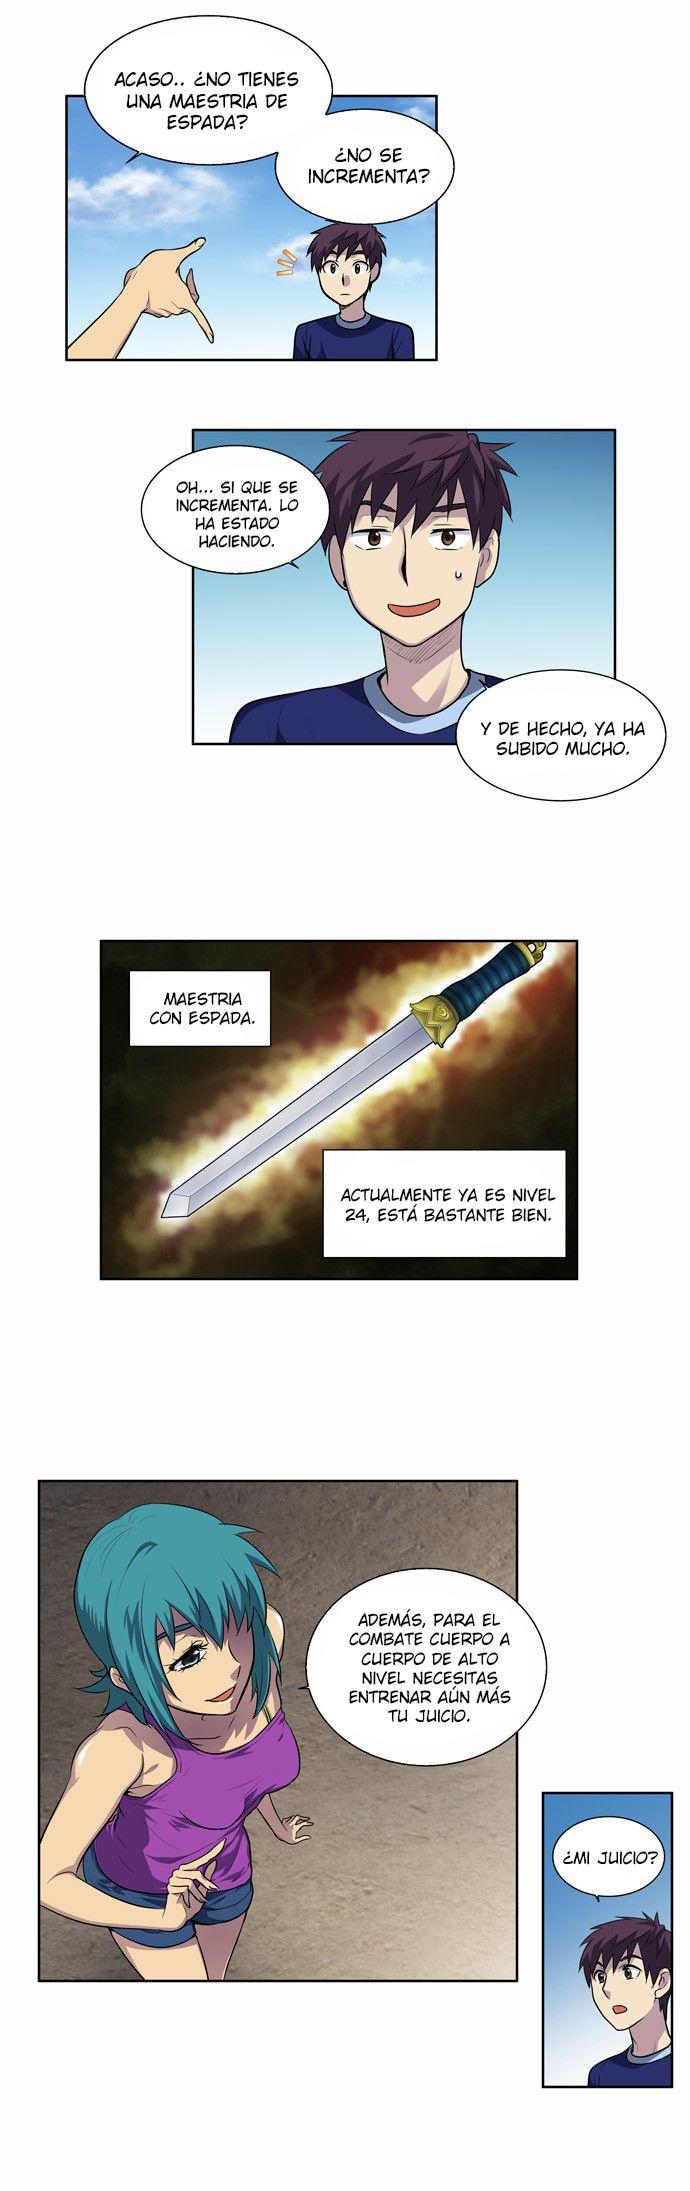 http://c5.ninemanga.com/es_manga/61/1725/464211/aaa3a39ecb096daff4d431a2e7abaff7.jpg Page 8